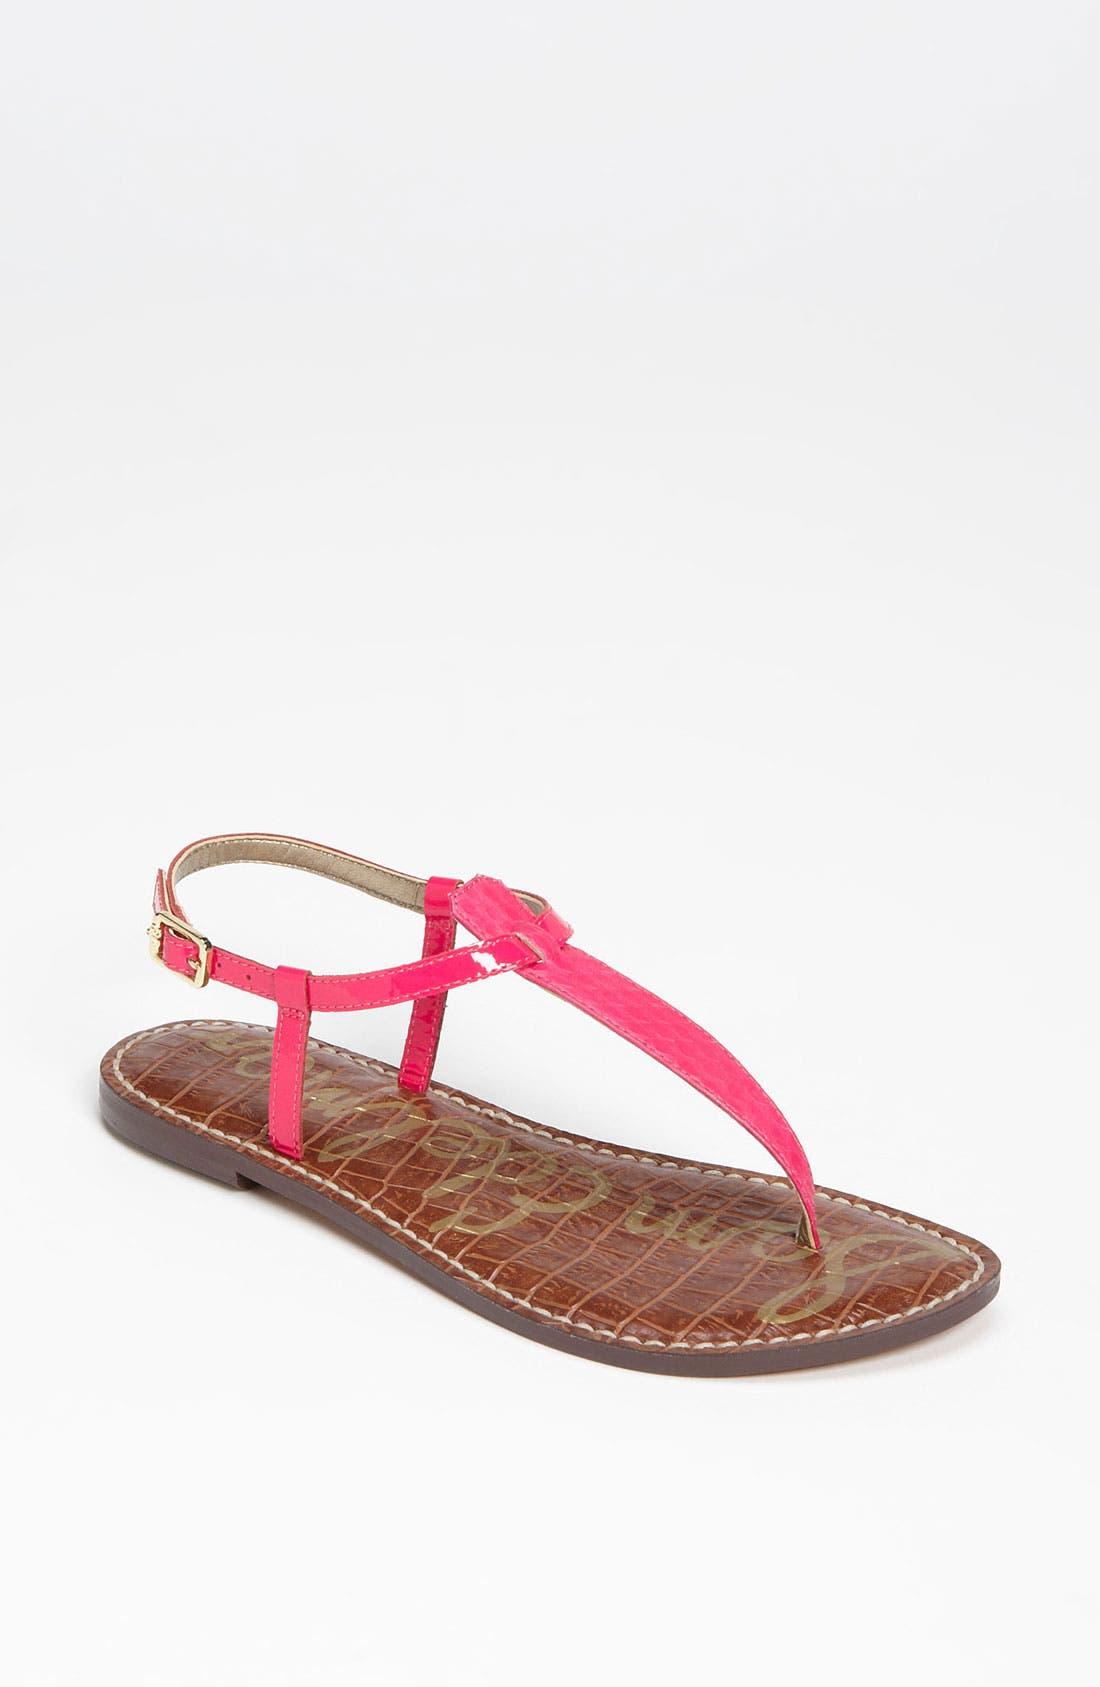 Alternate Image 1 Selected - Sam Edelman 'Gigi' Sandal (Women) (Exclusive Color)